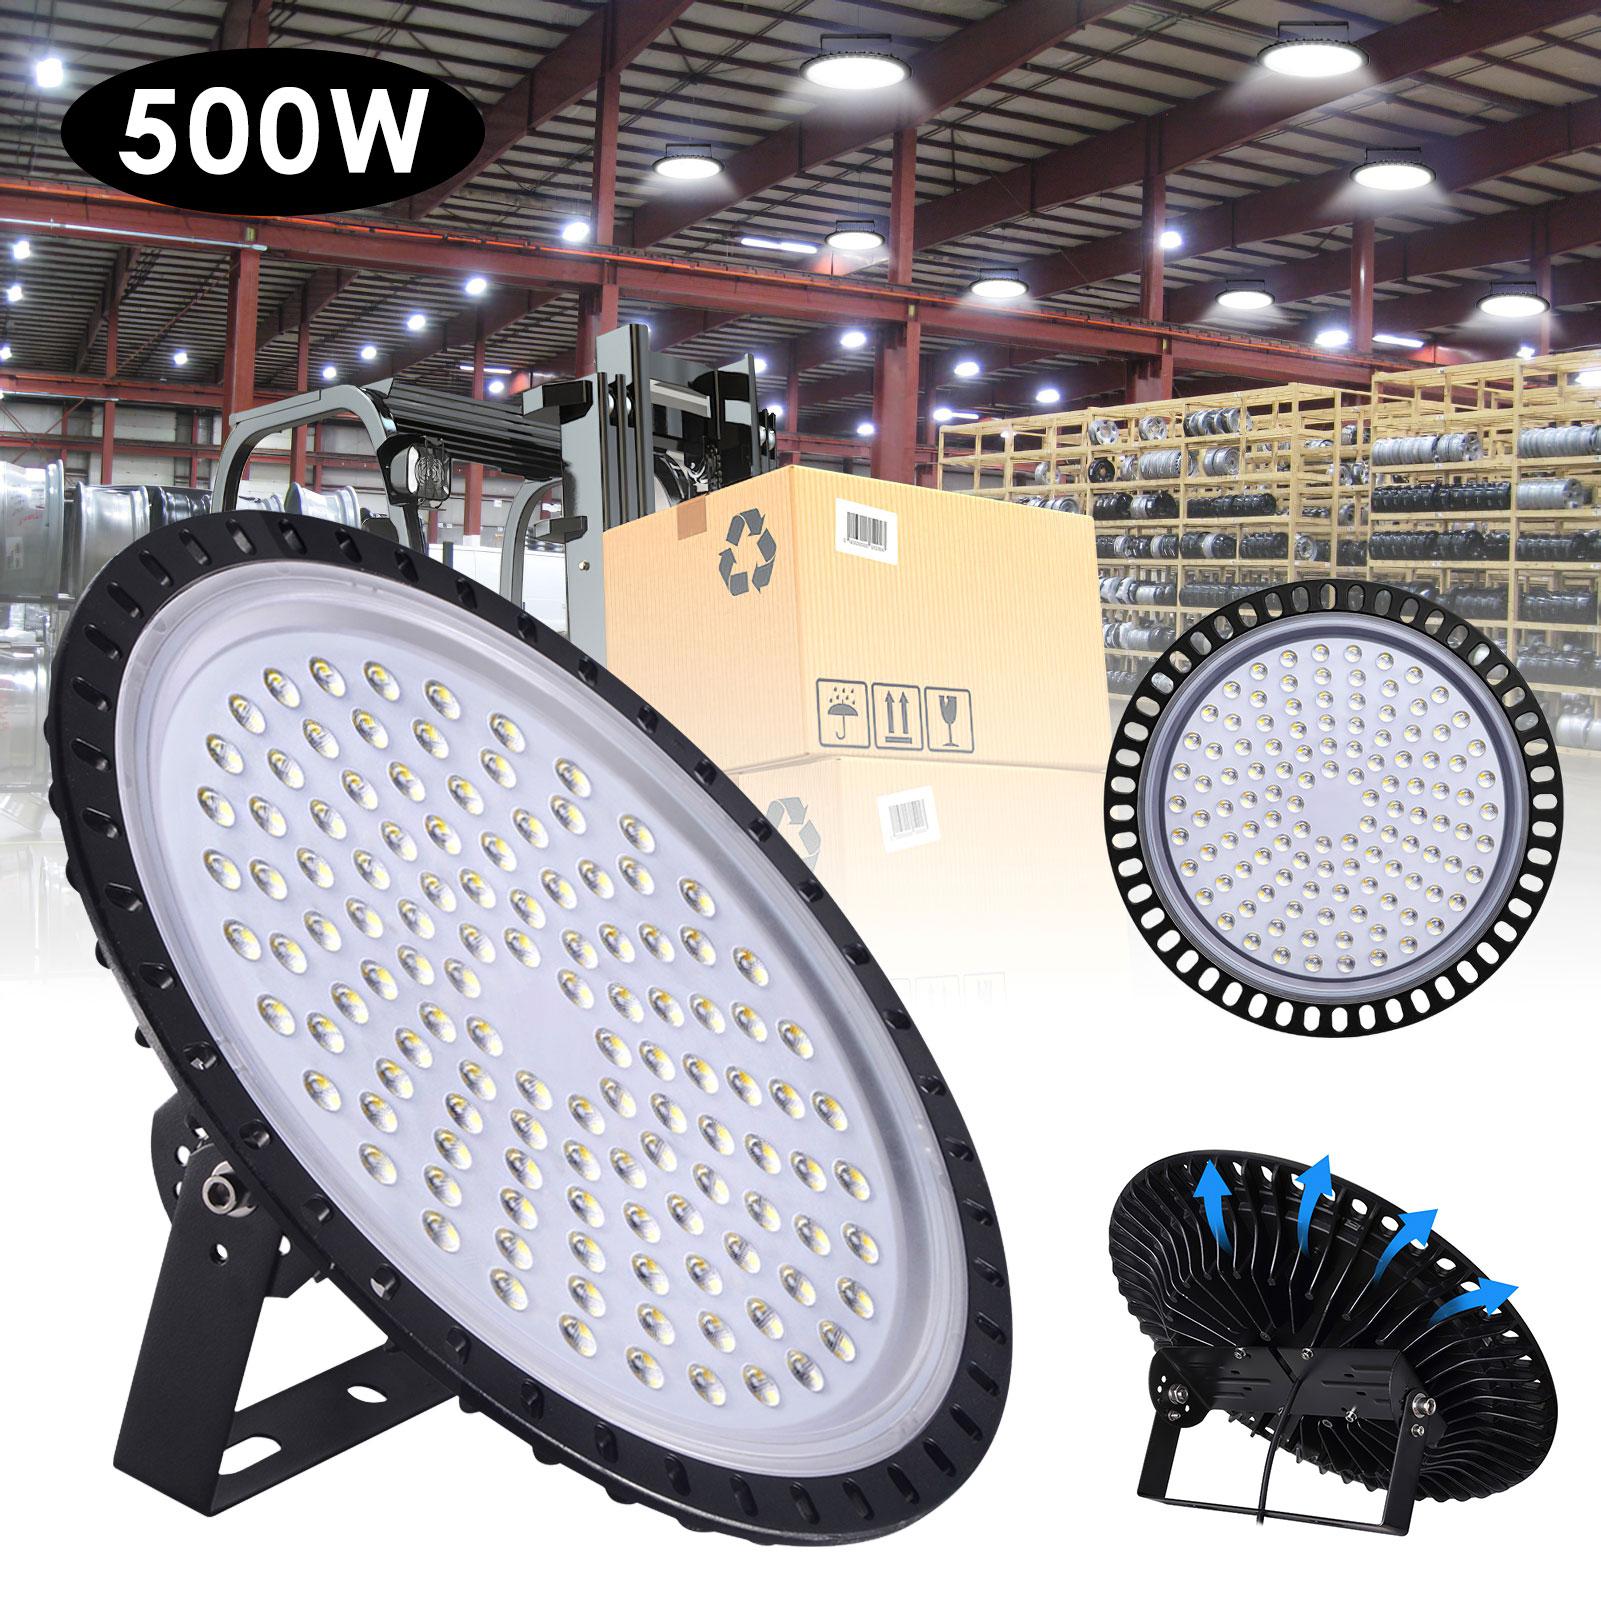 3rd Generation UFO Mining Lamp Cold White WaterProof LED HighBay Light Ultra Slim Mining Light for Garages Warehouse Basement